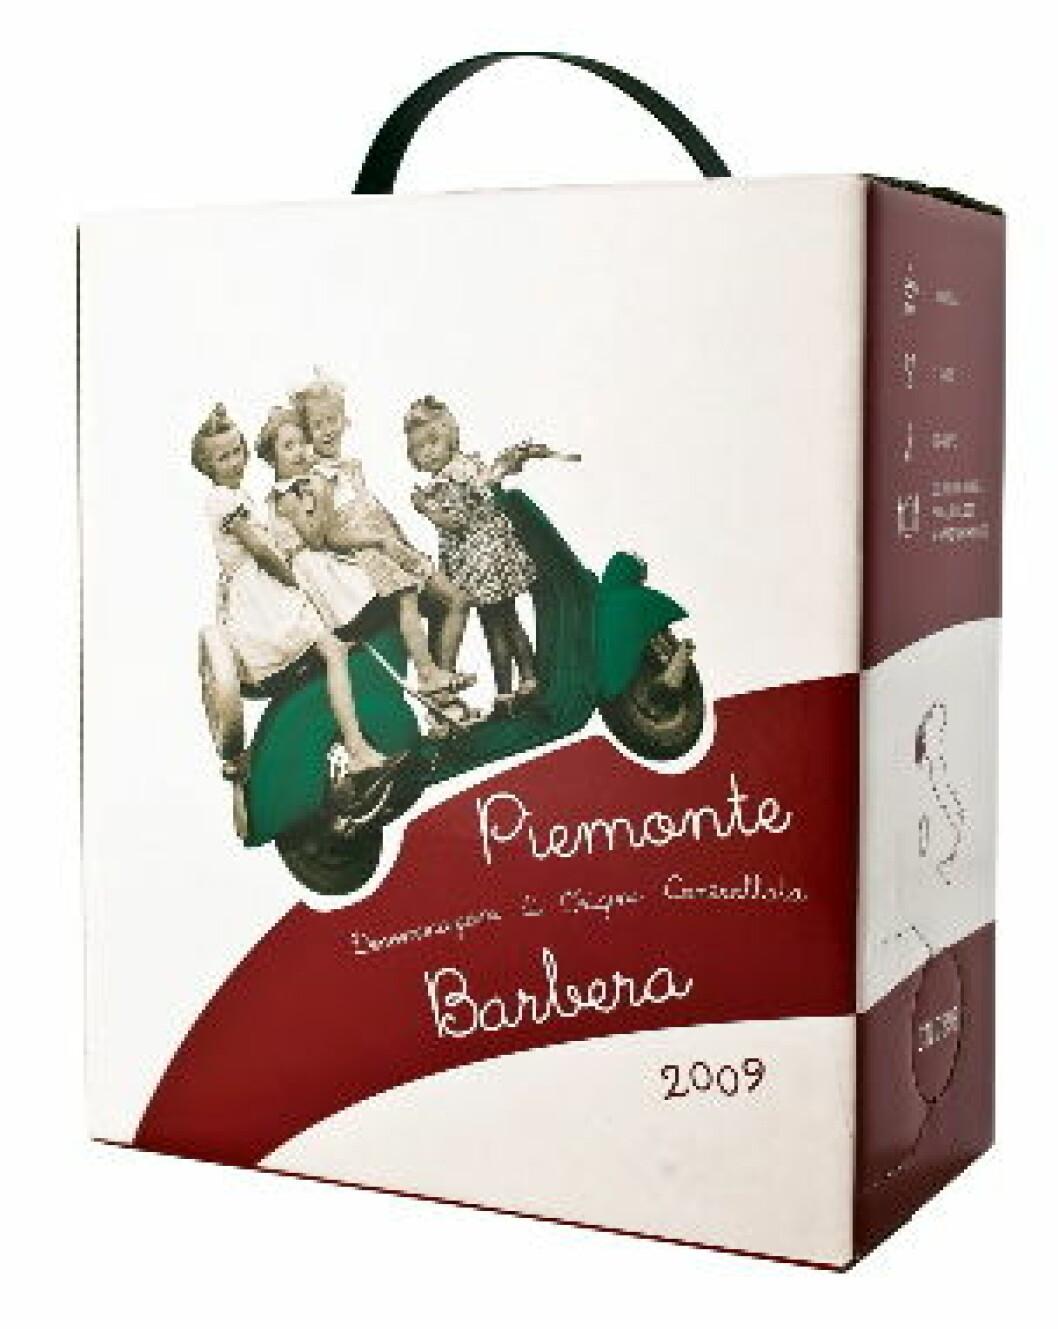 Vespa Piemonte Barbera